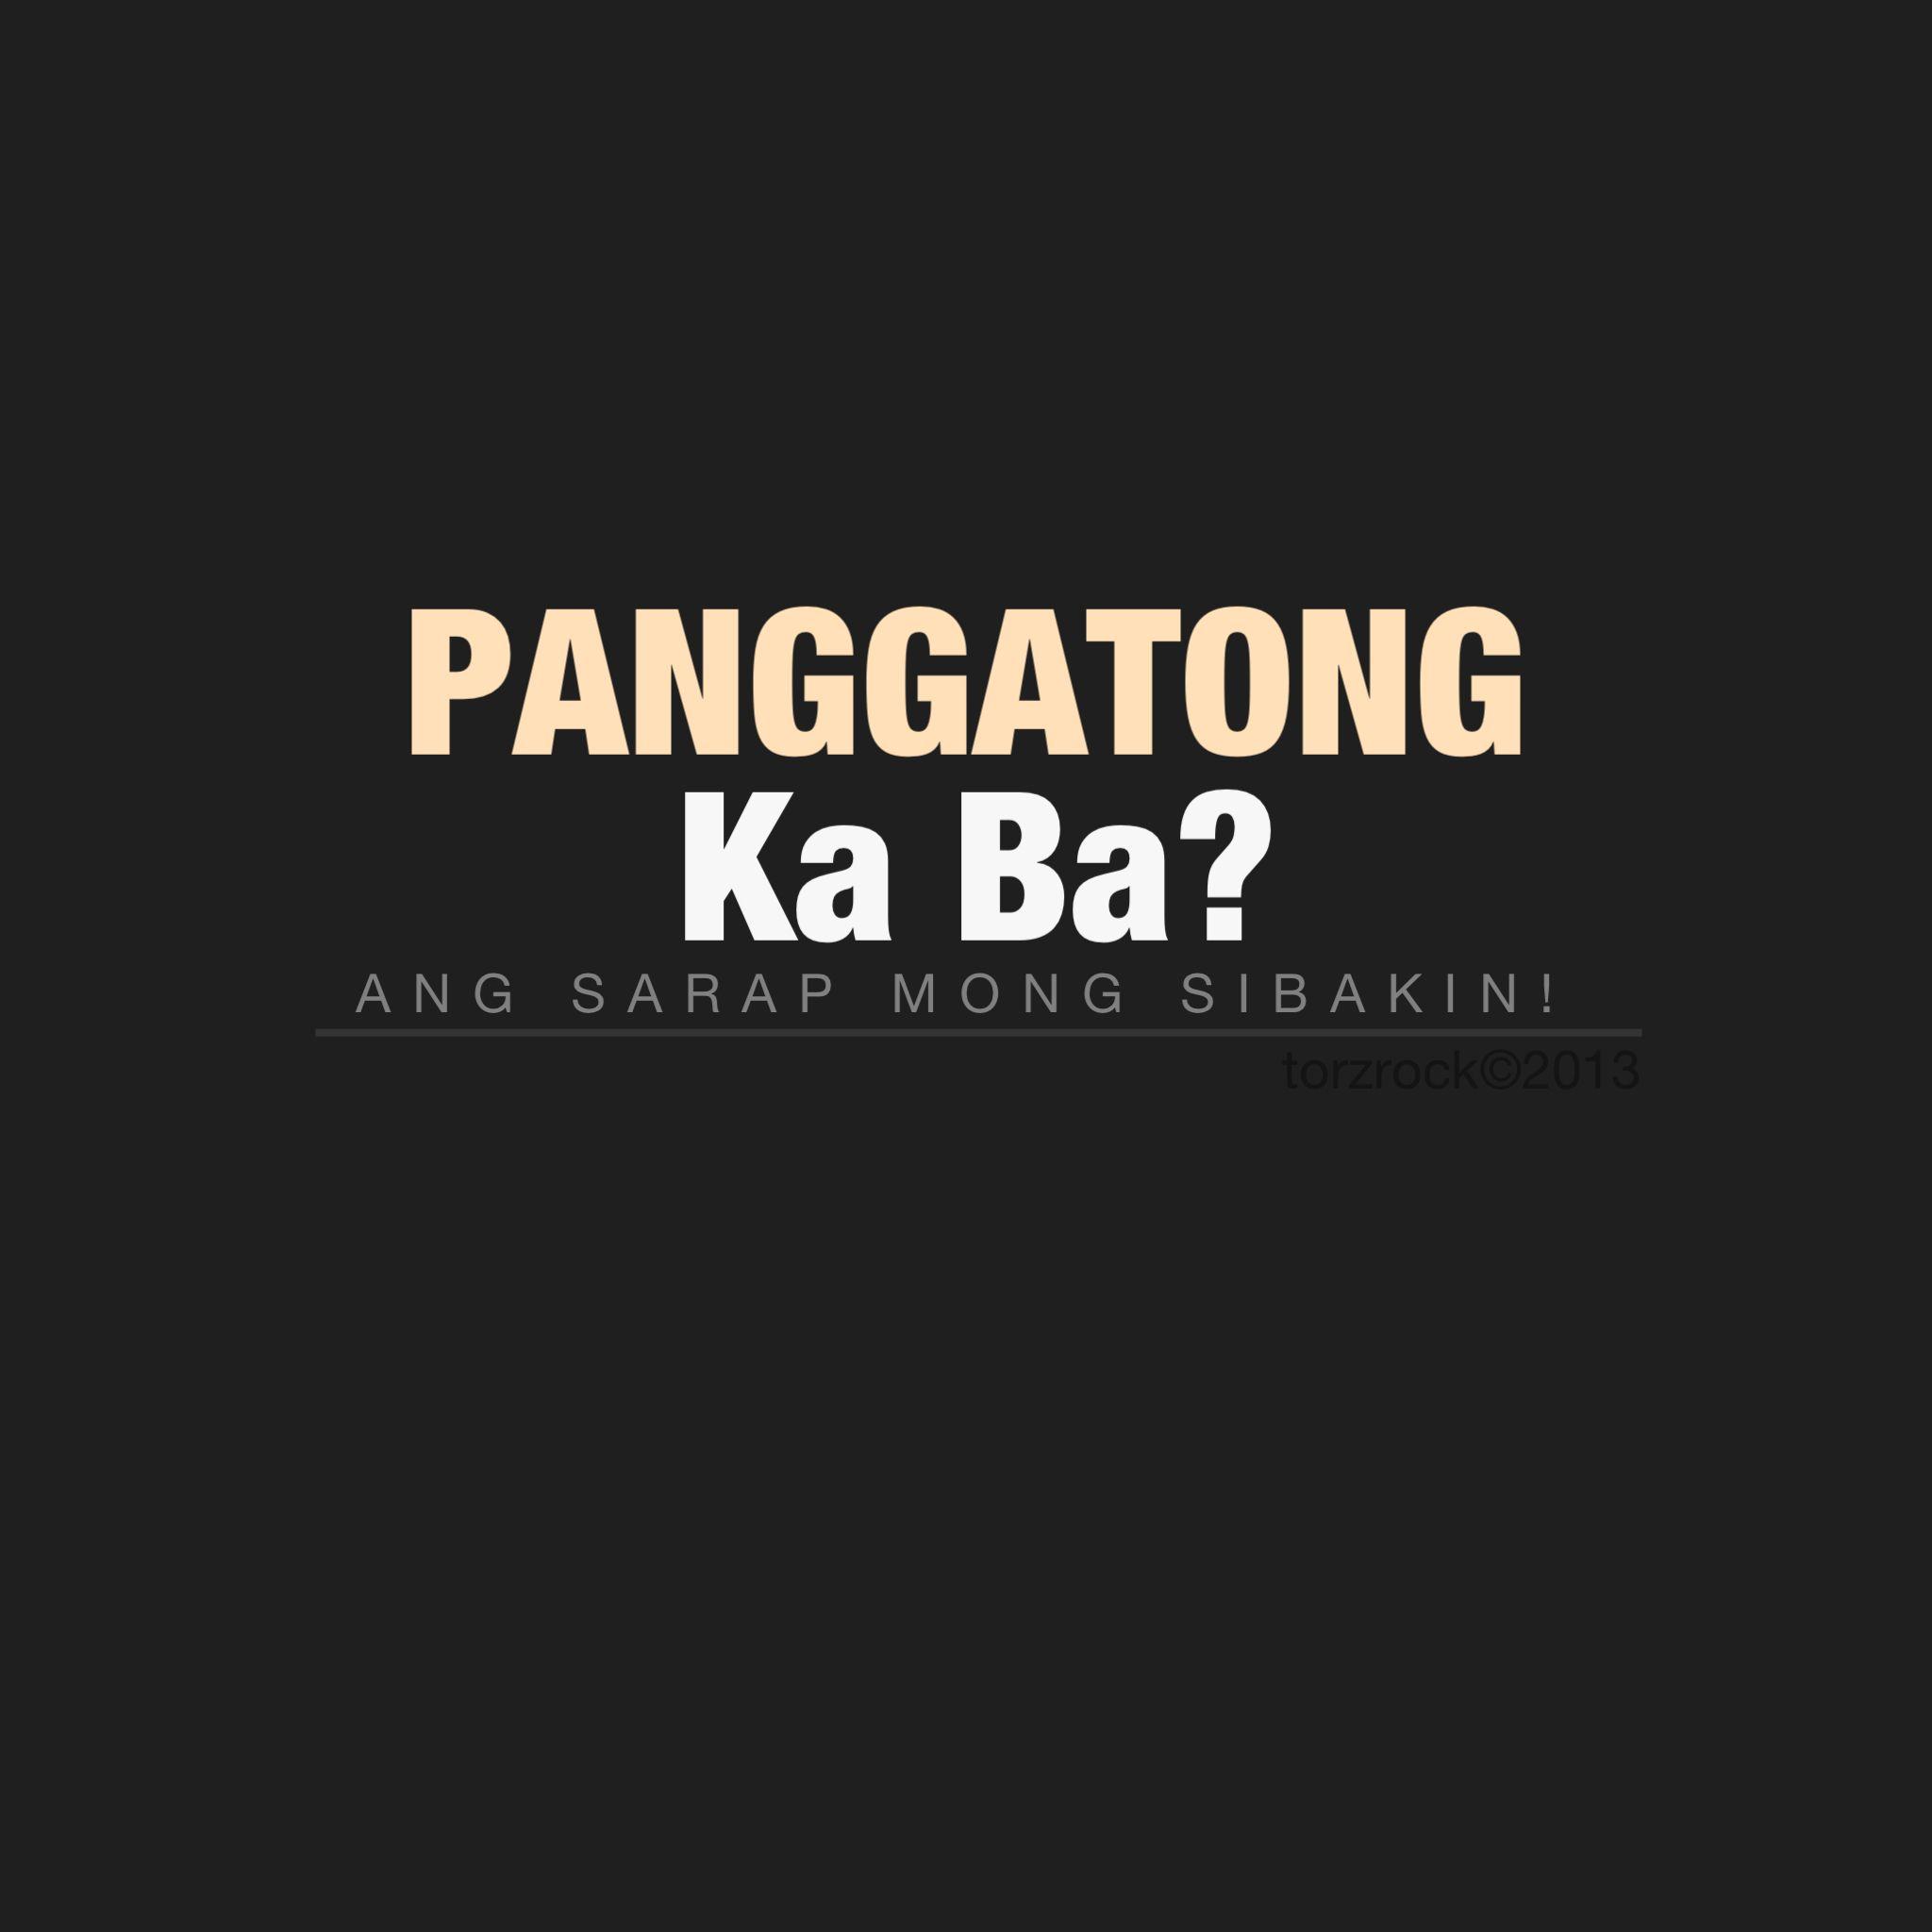 panggatong